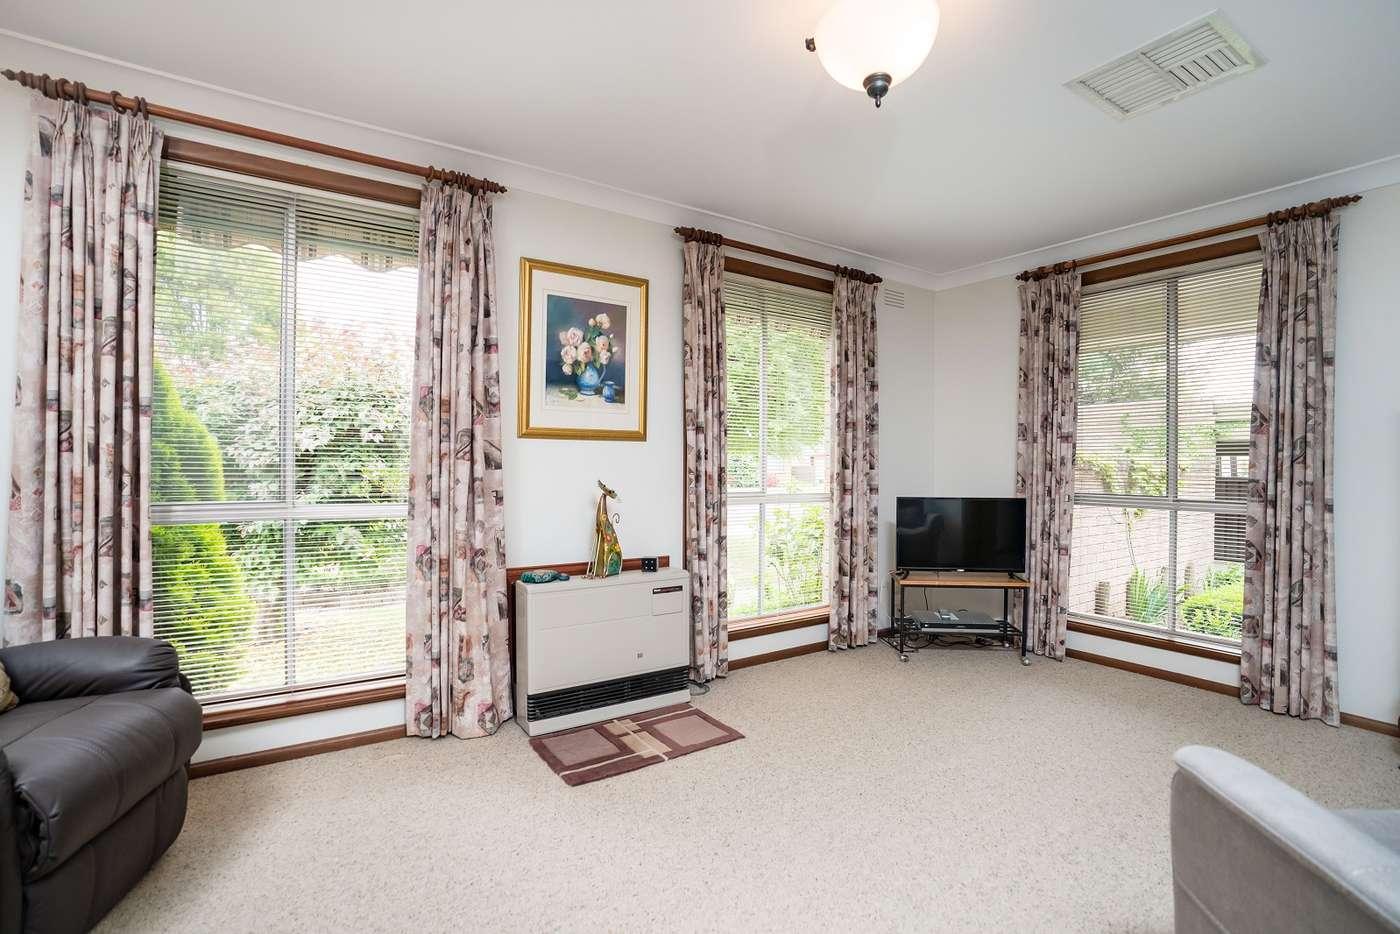 Seventh view of Homely house listing, 8 Glenairne Street, Wodonga VIC 3690